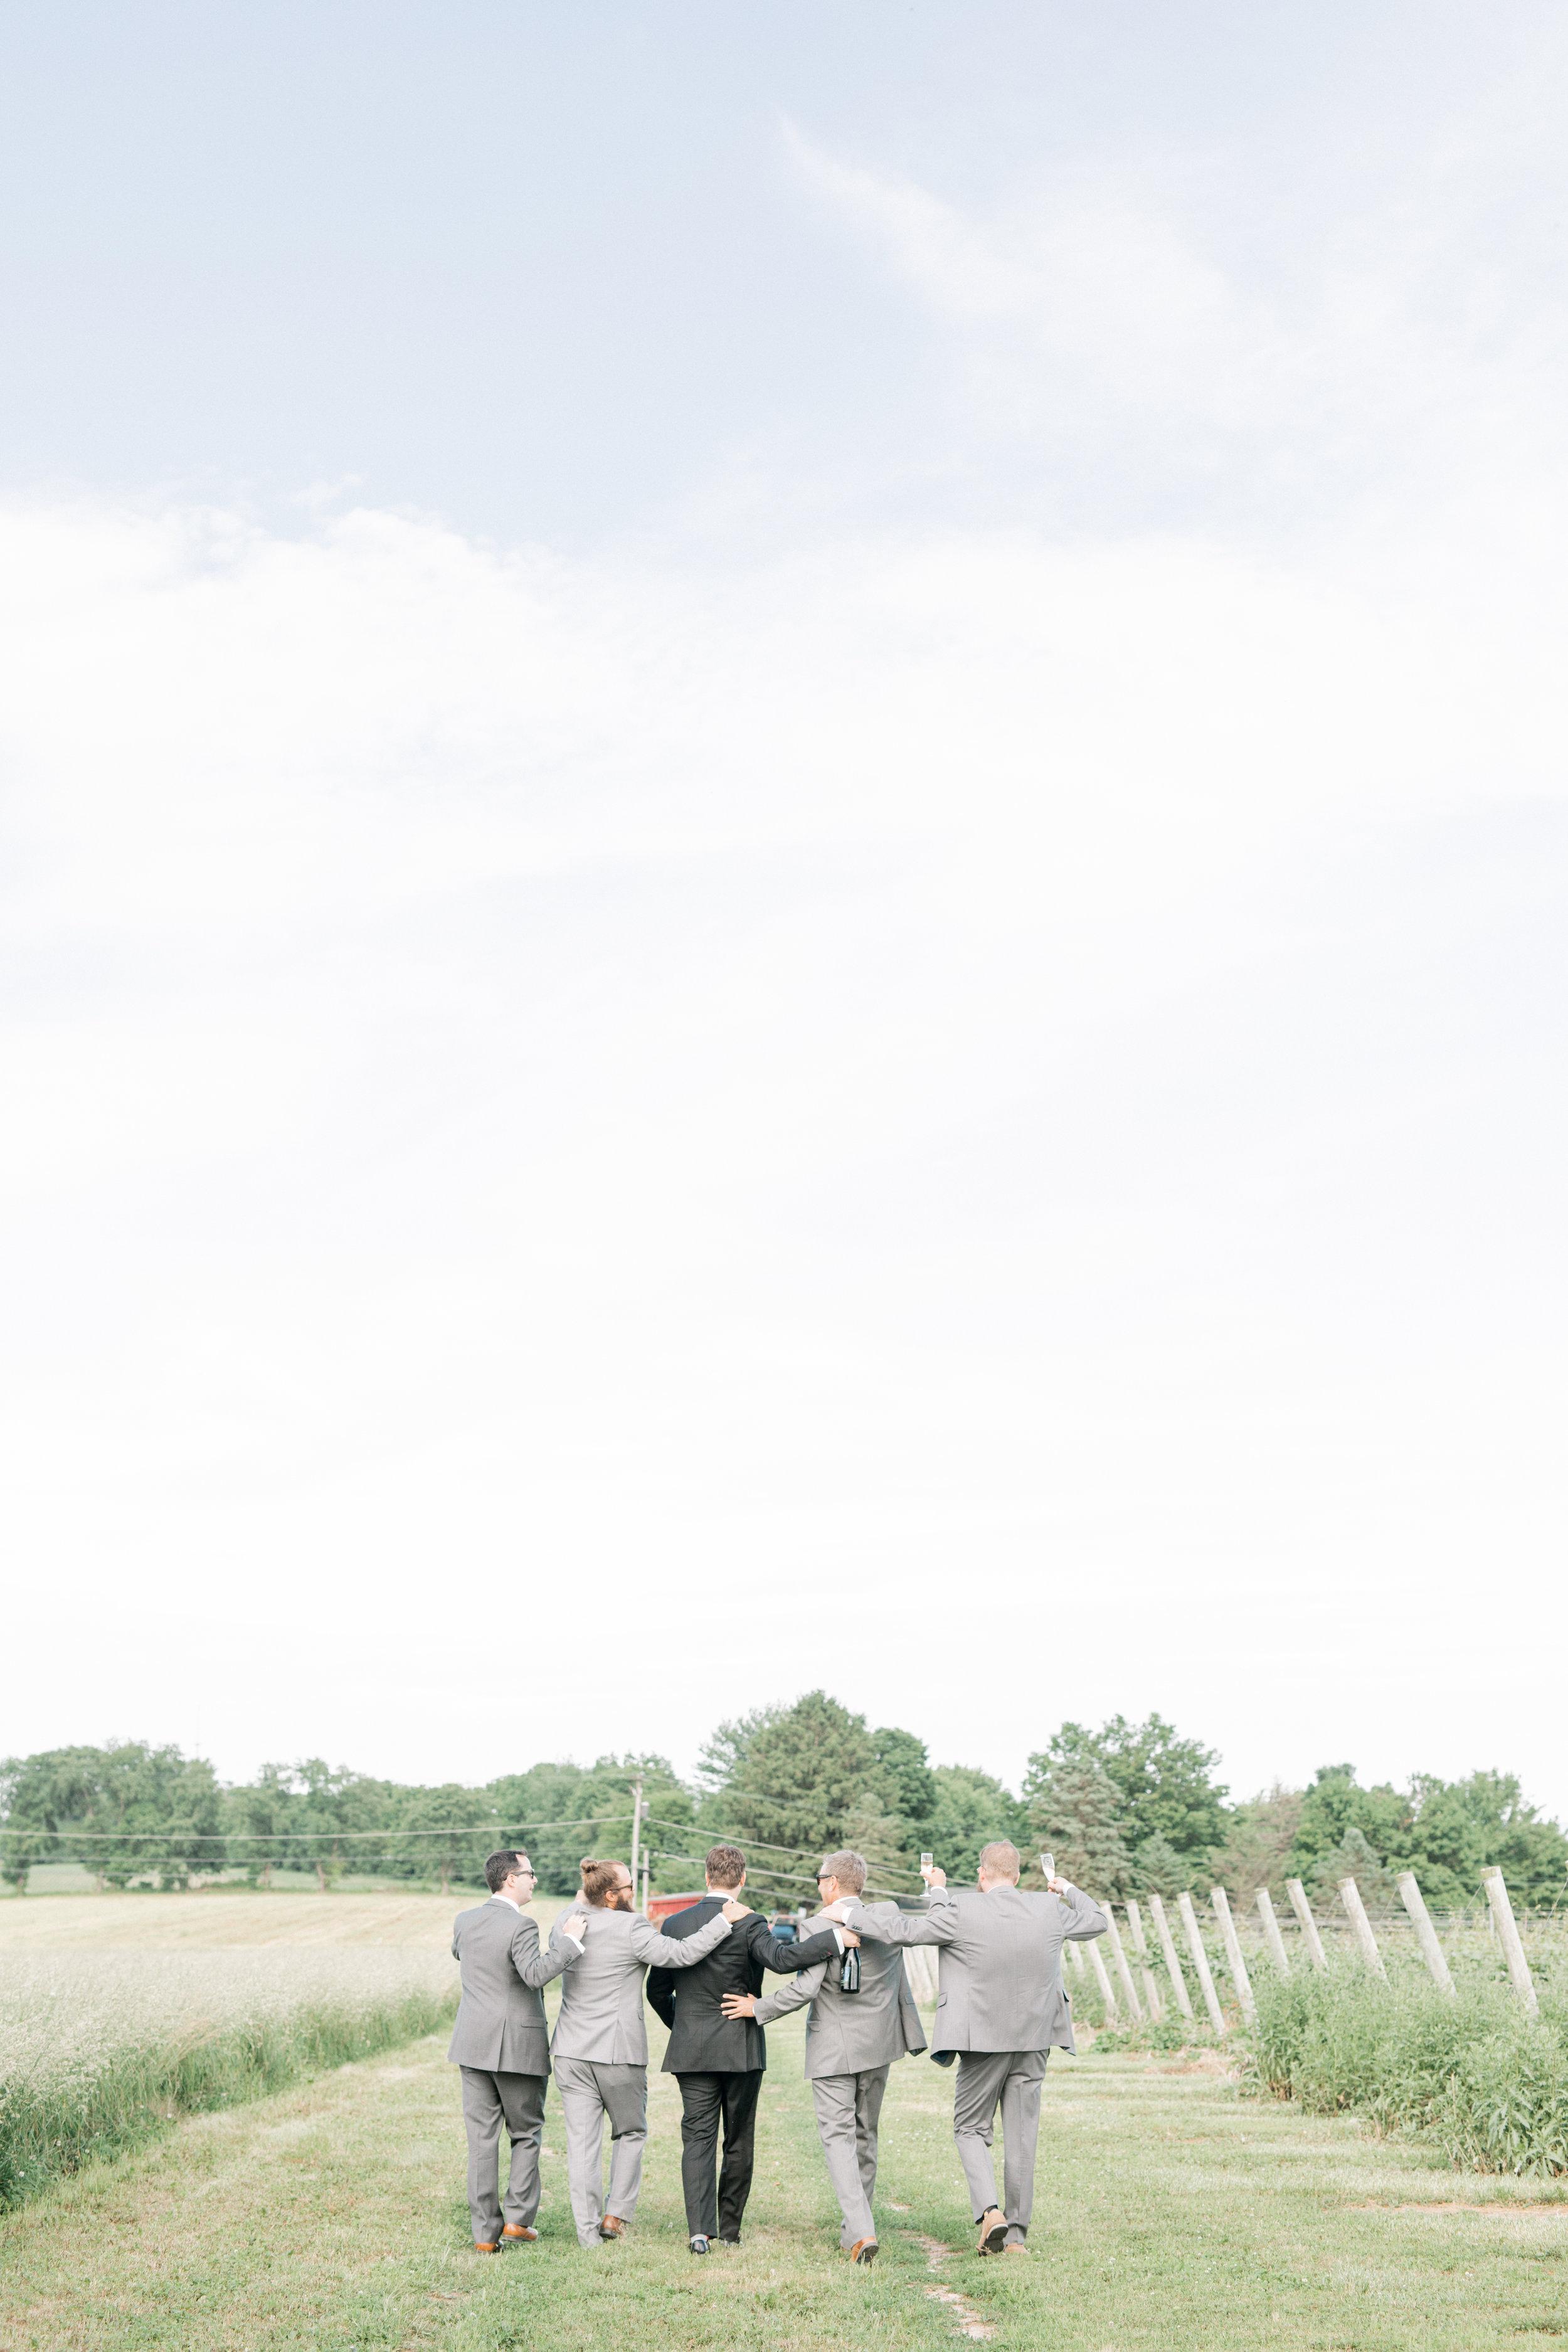 haley-richter-photography-fero-vineyards-summer-wedding-allison-and-josh-winery-pennsylvania-145.jpg